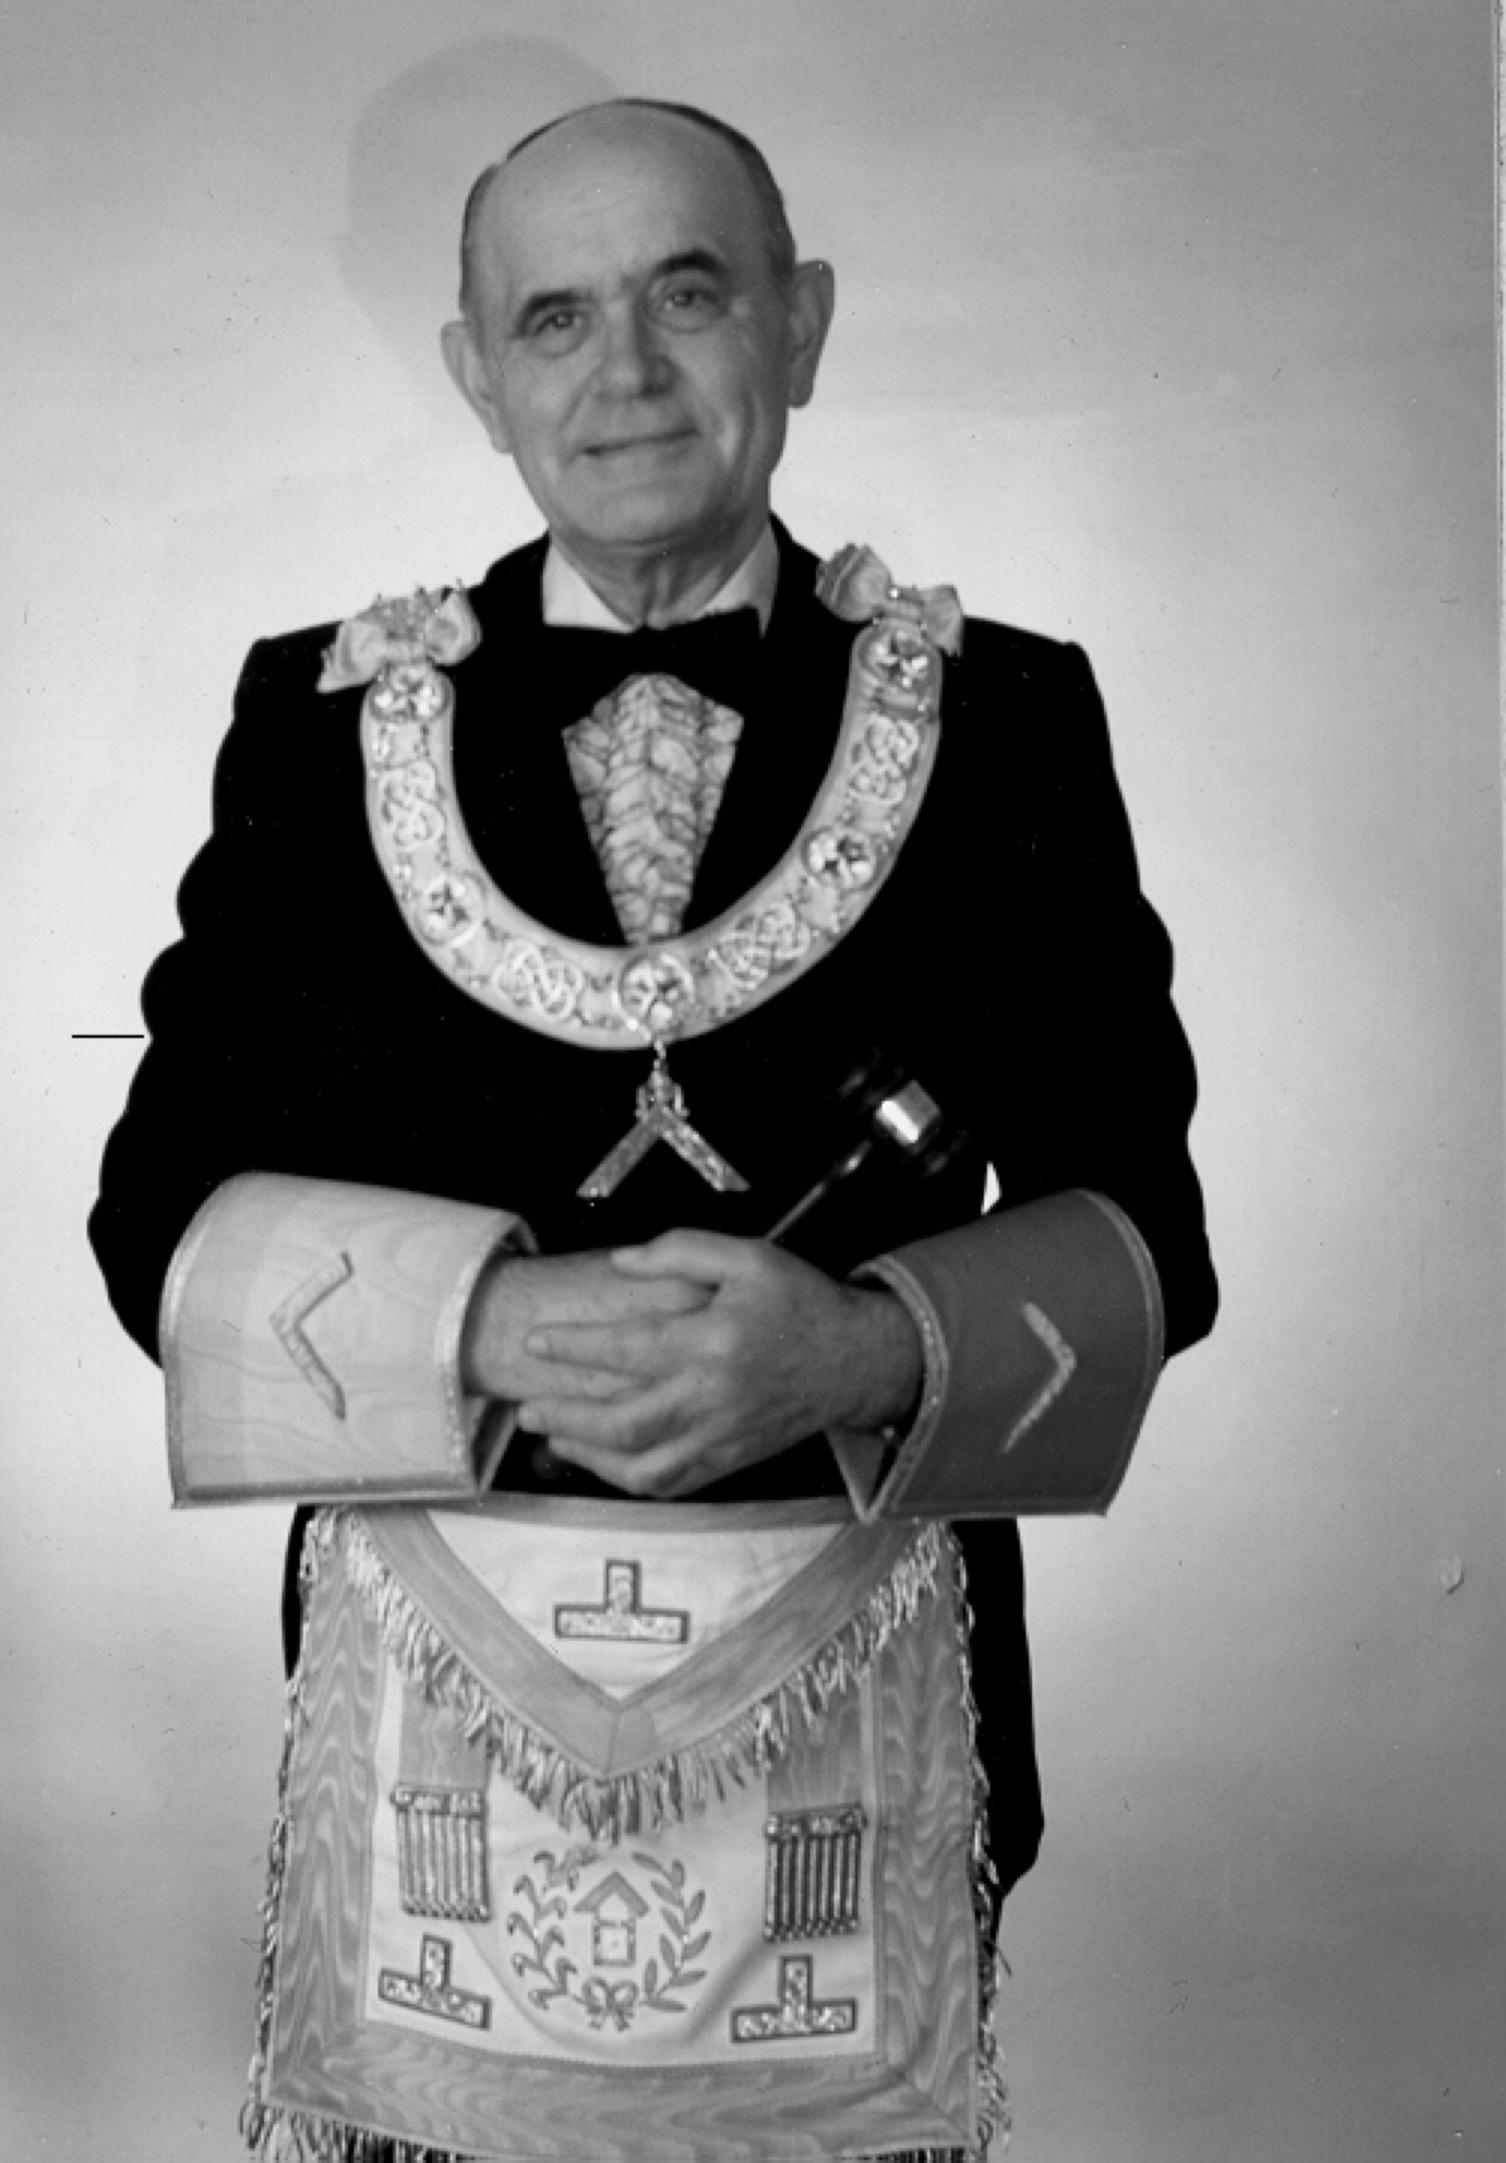 John George Kasmer 1984 - 85 - 86